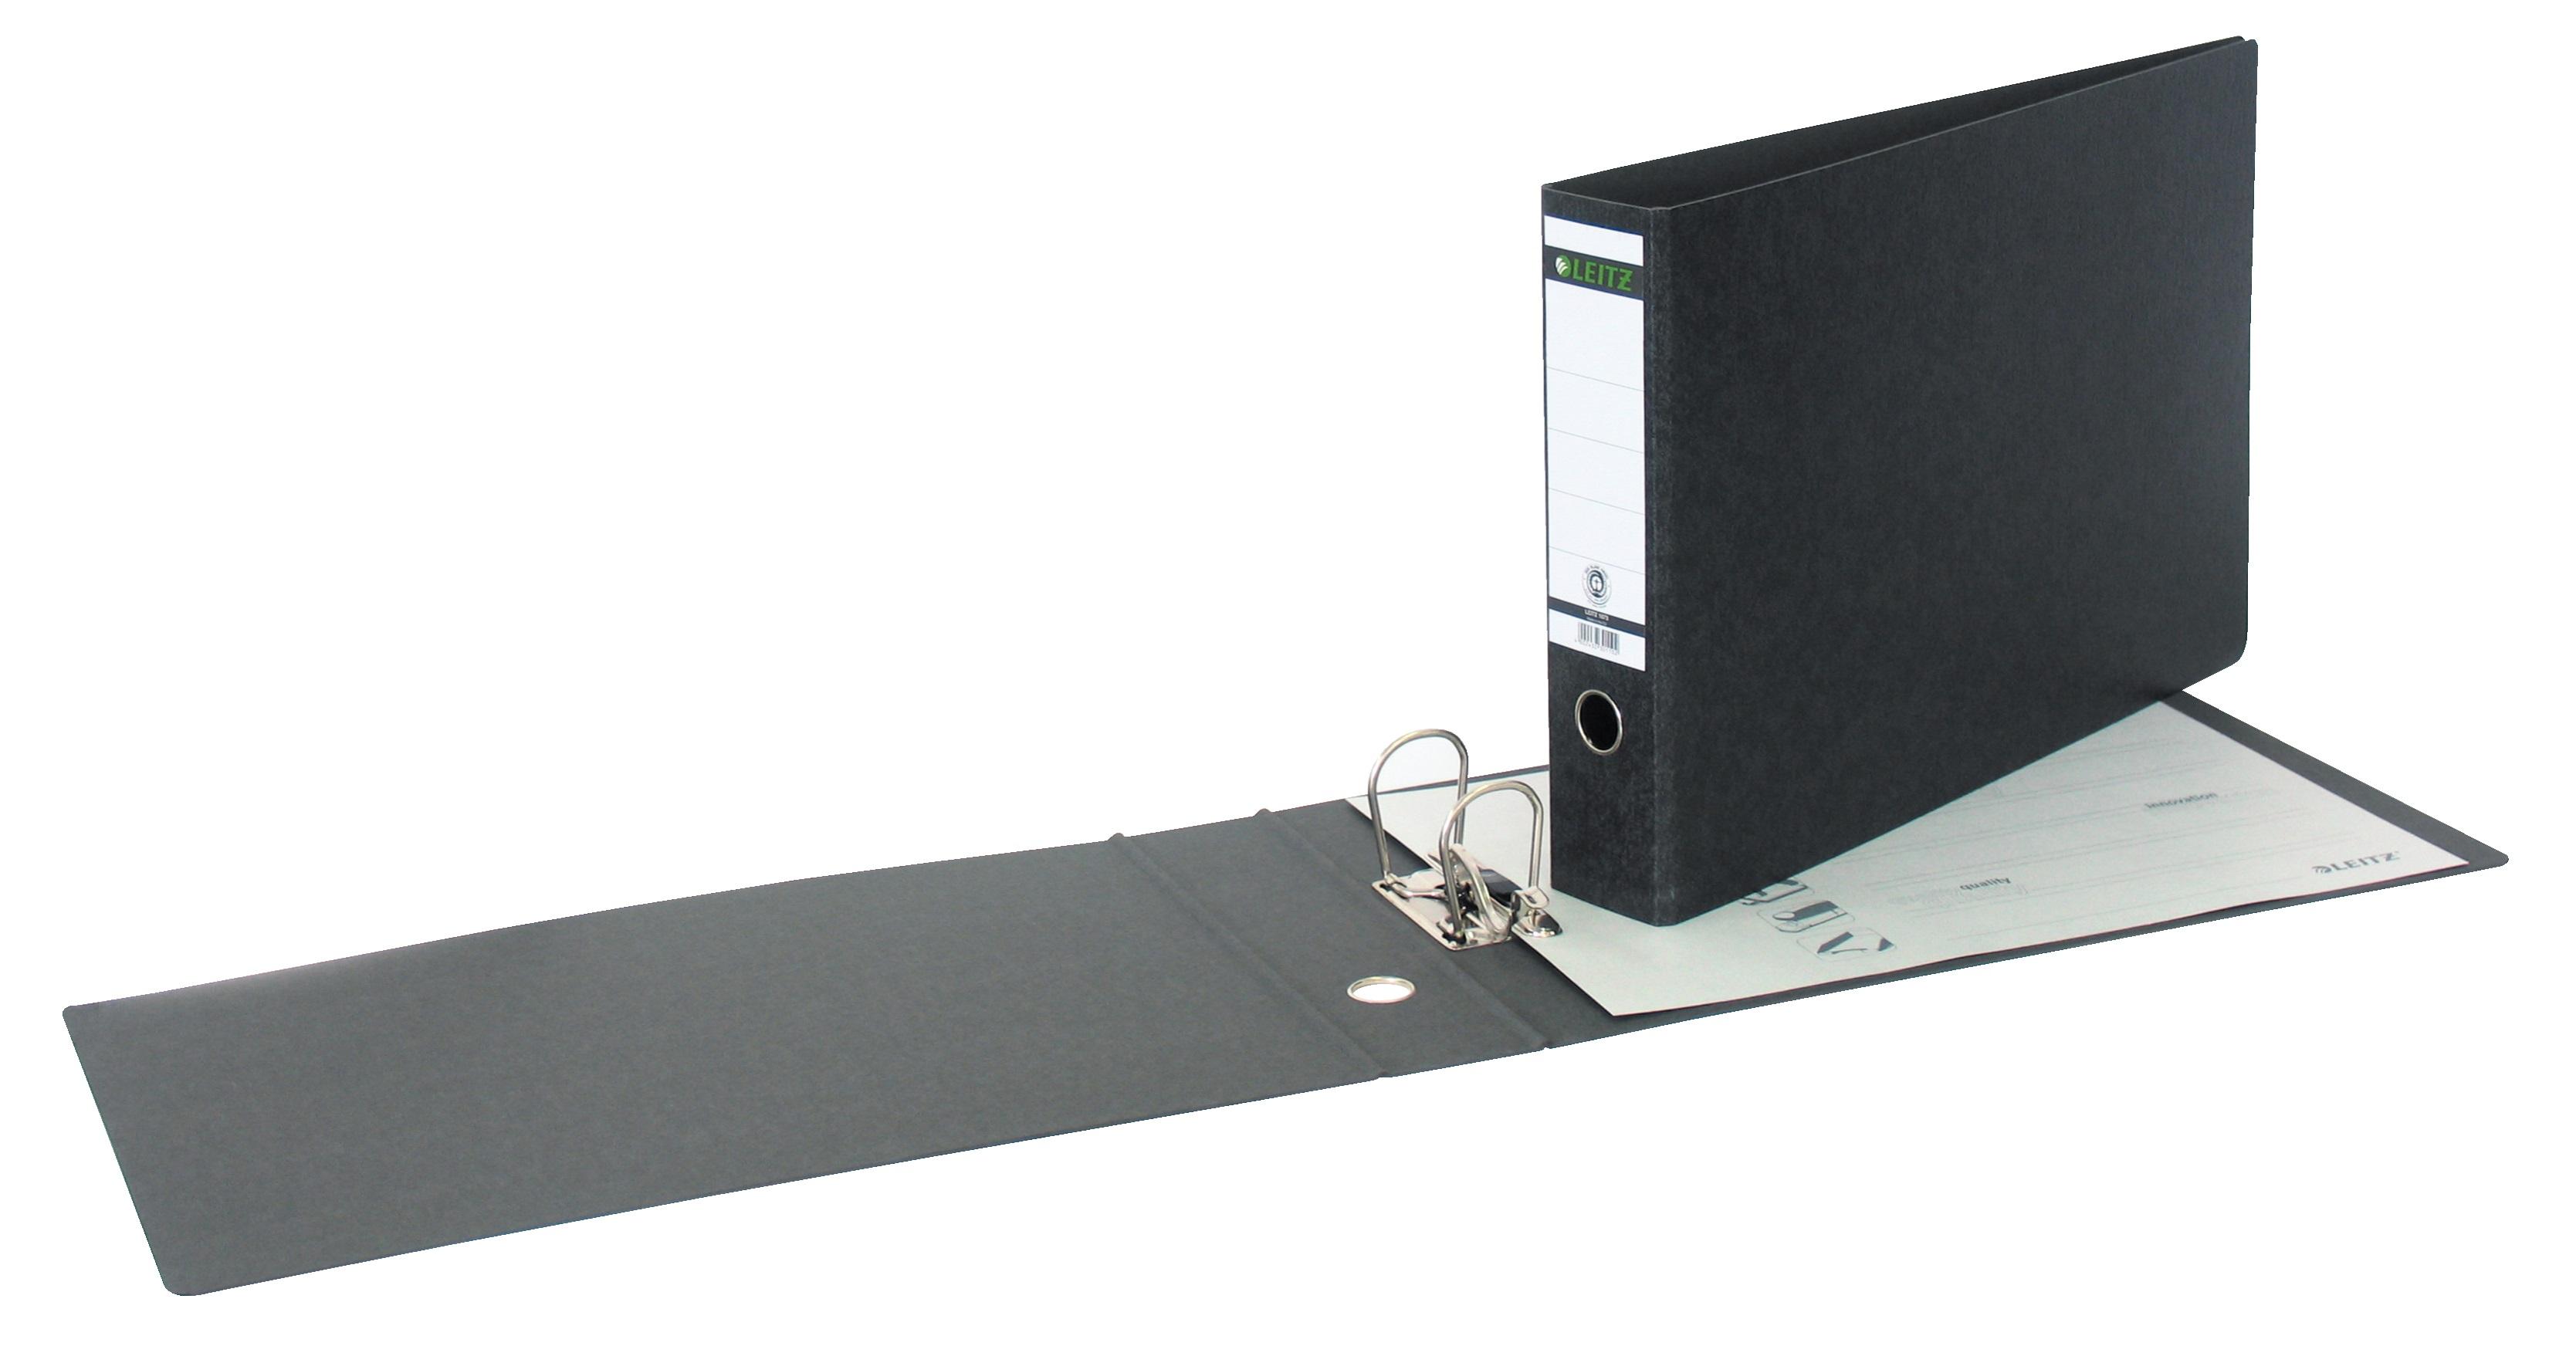 Descriere Biblioraft A3, 7.7cm, negru, LEITZ 180°